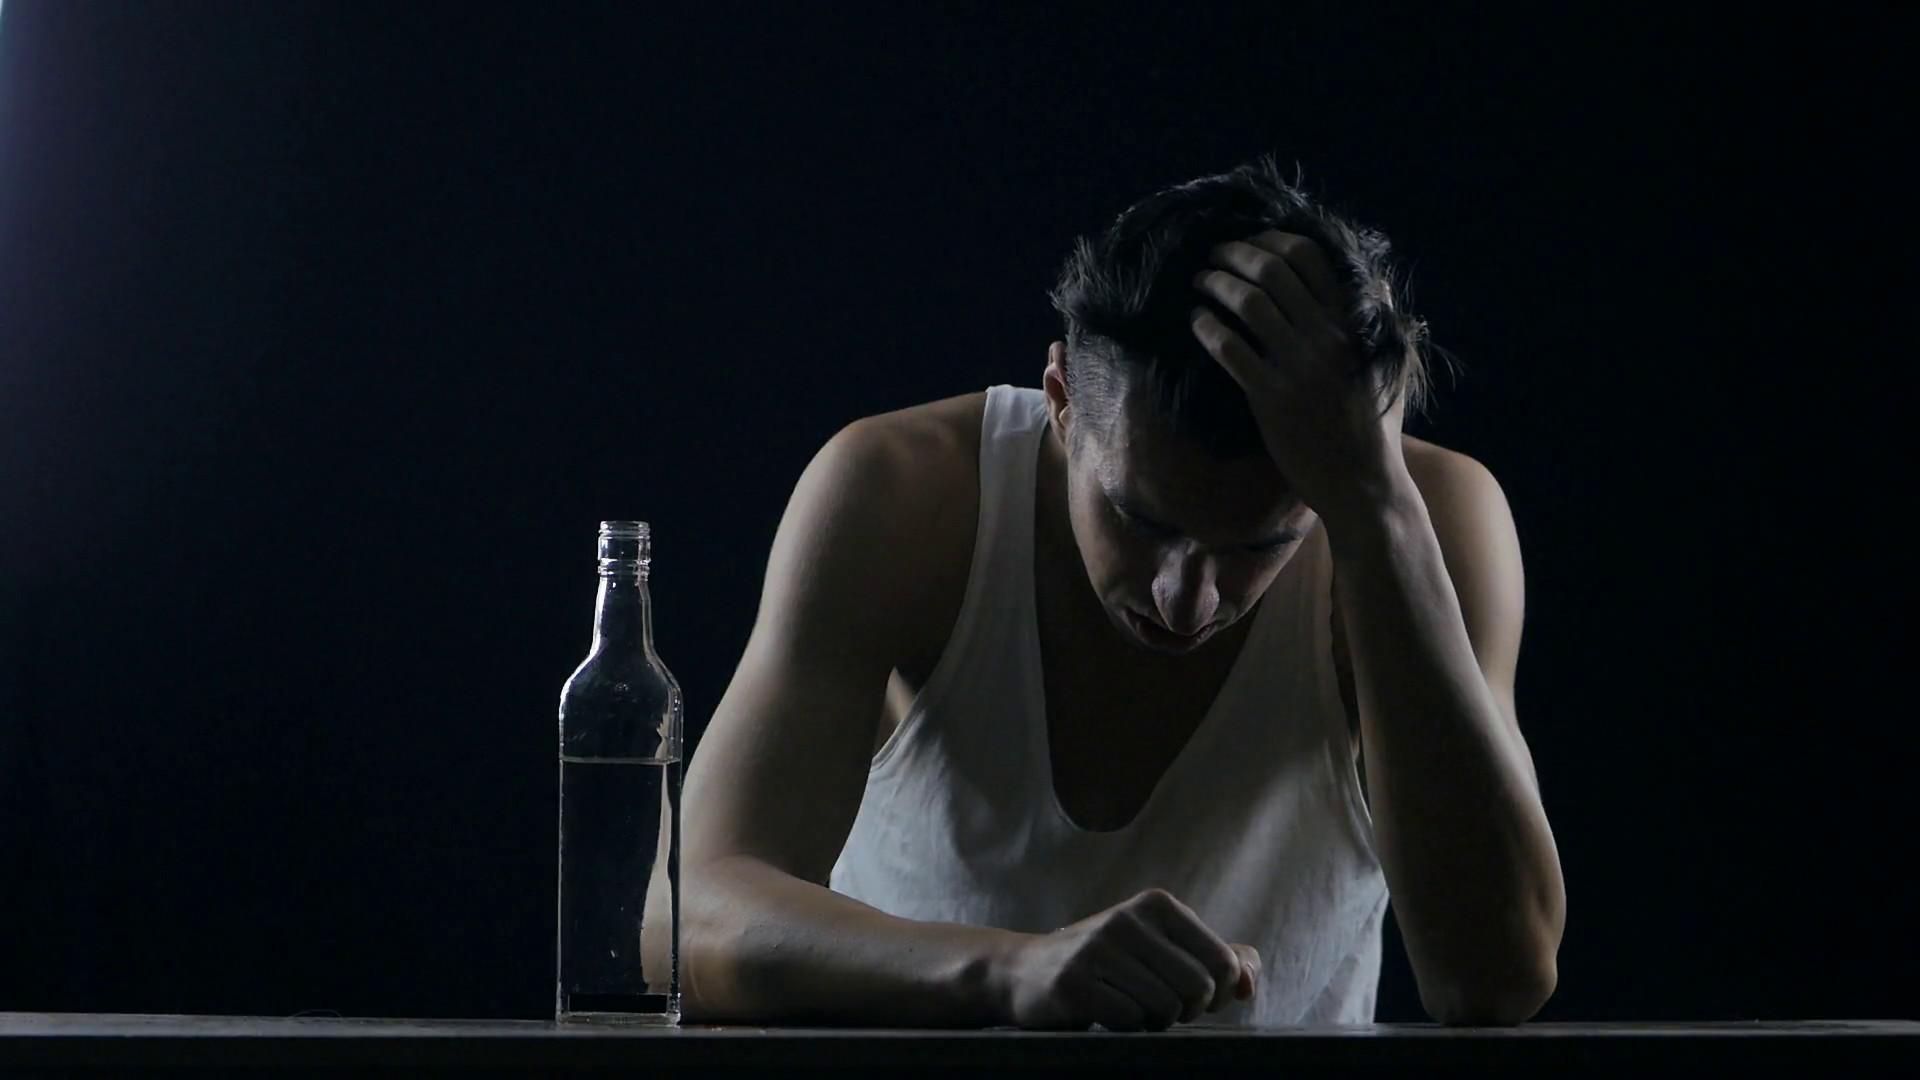 depressed man drinking alcohol alone in a dark room. man in despair Stock  Video Footage – VideoBlocks